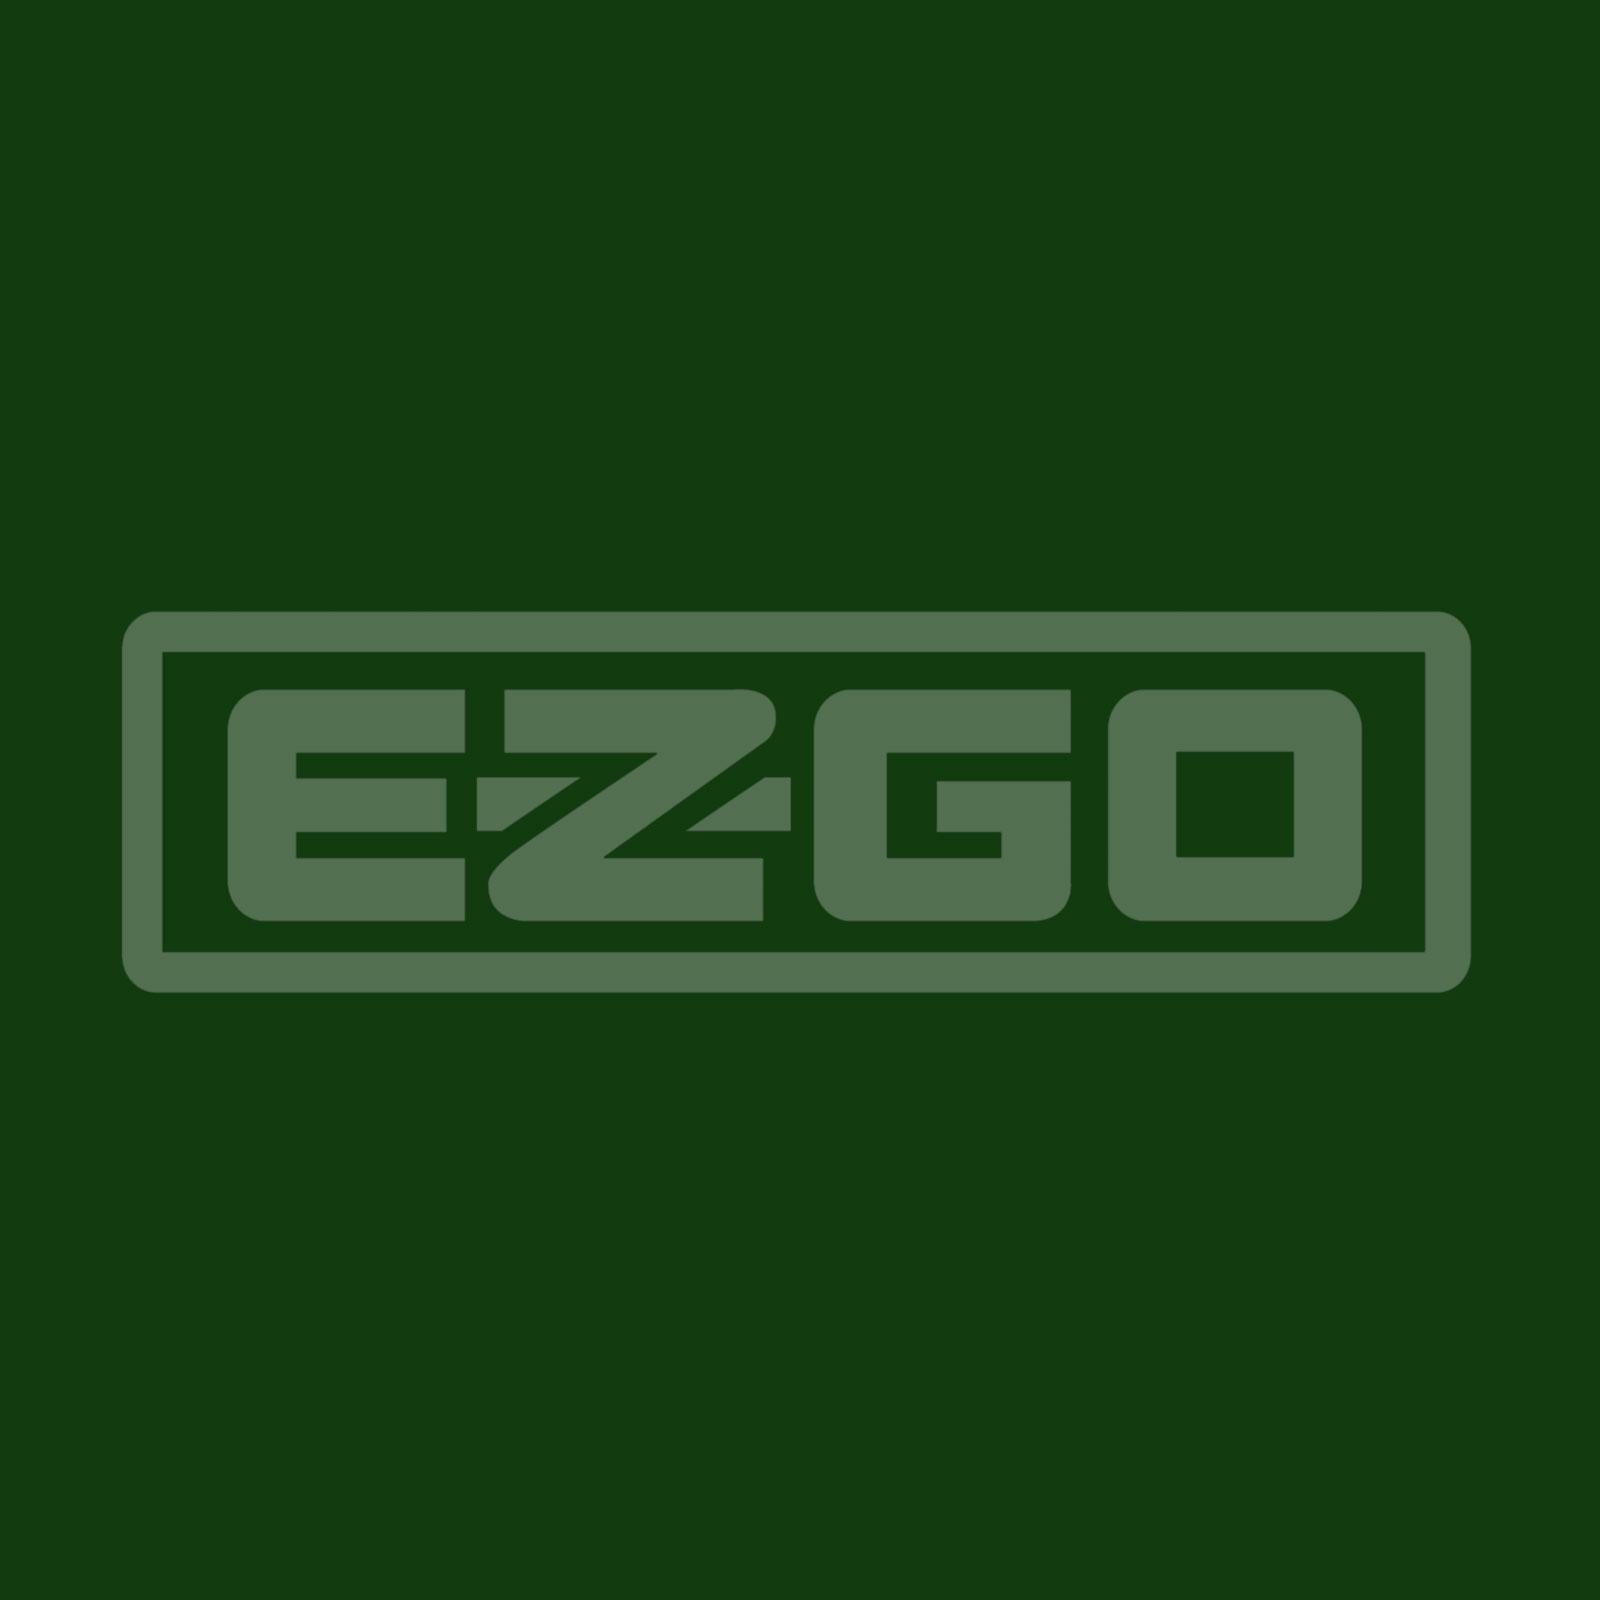 EZGO Forest Green Placeholder